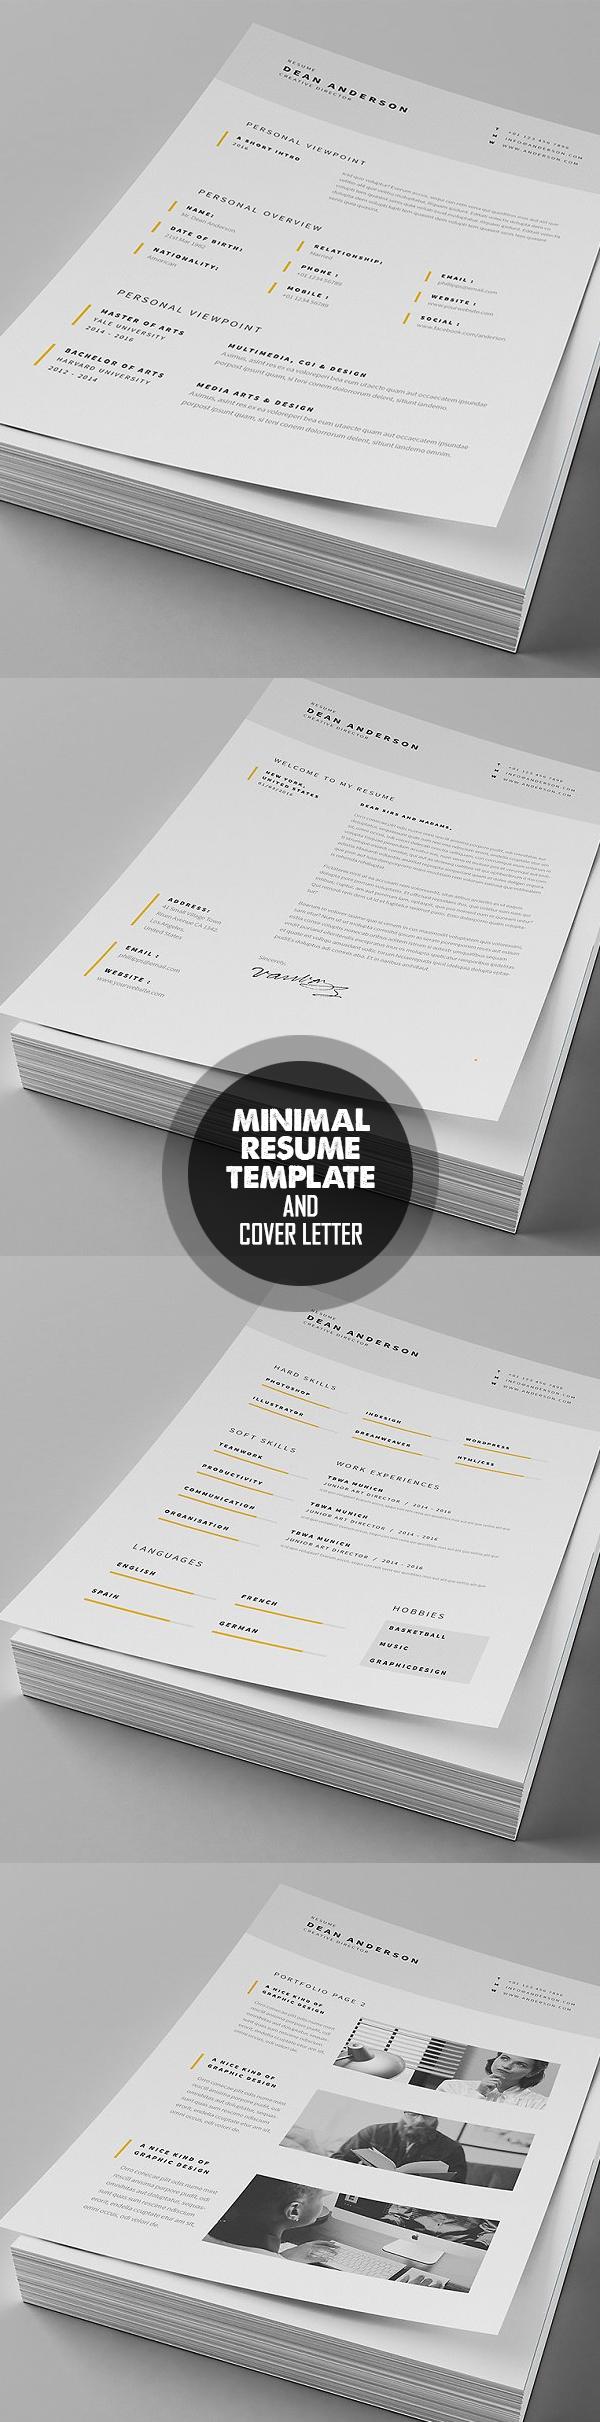 Minimal Resume  Cover Letter Template #resumedesign